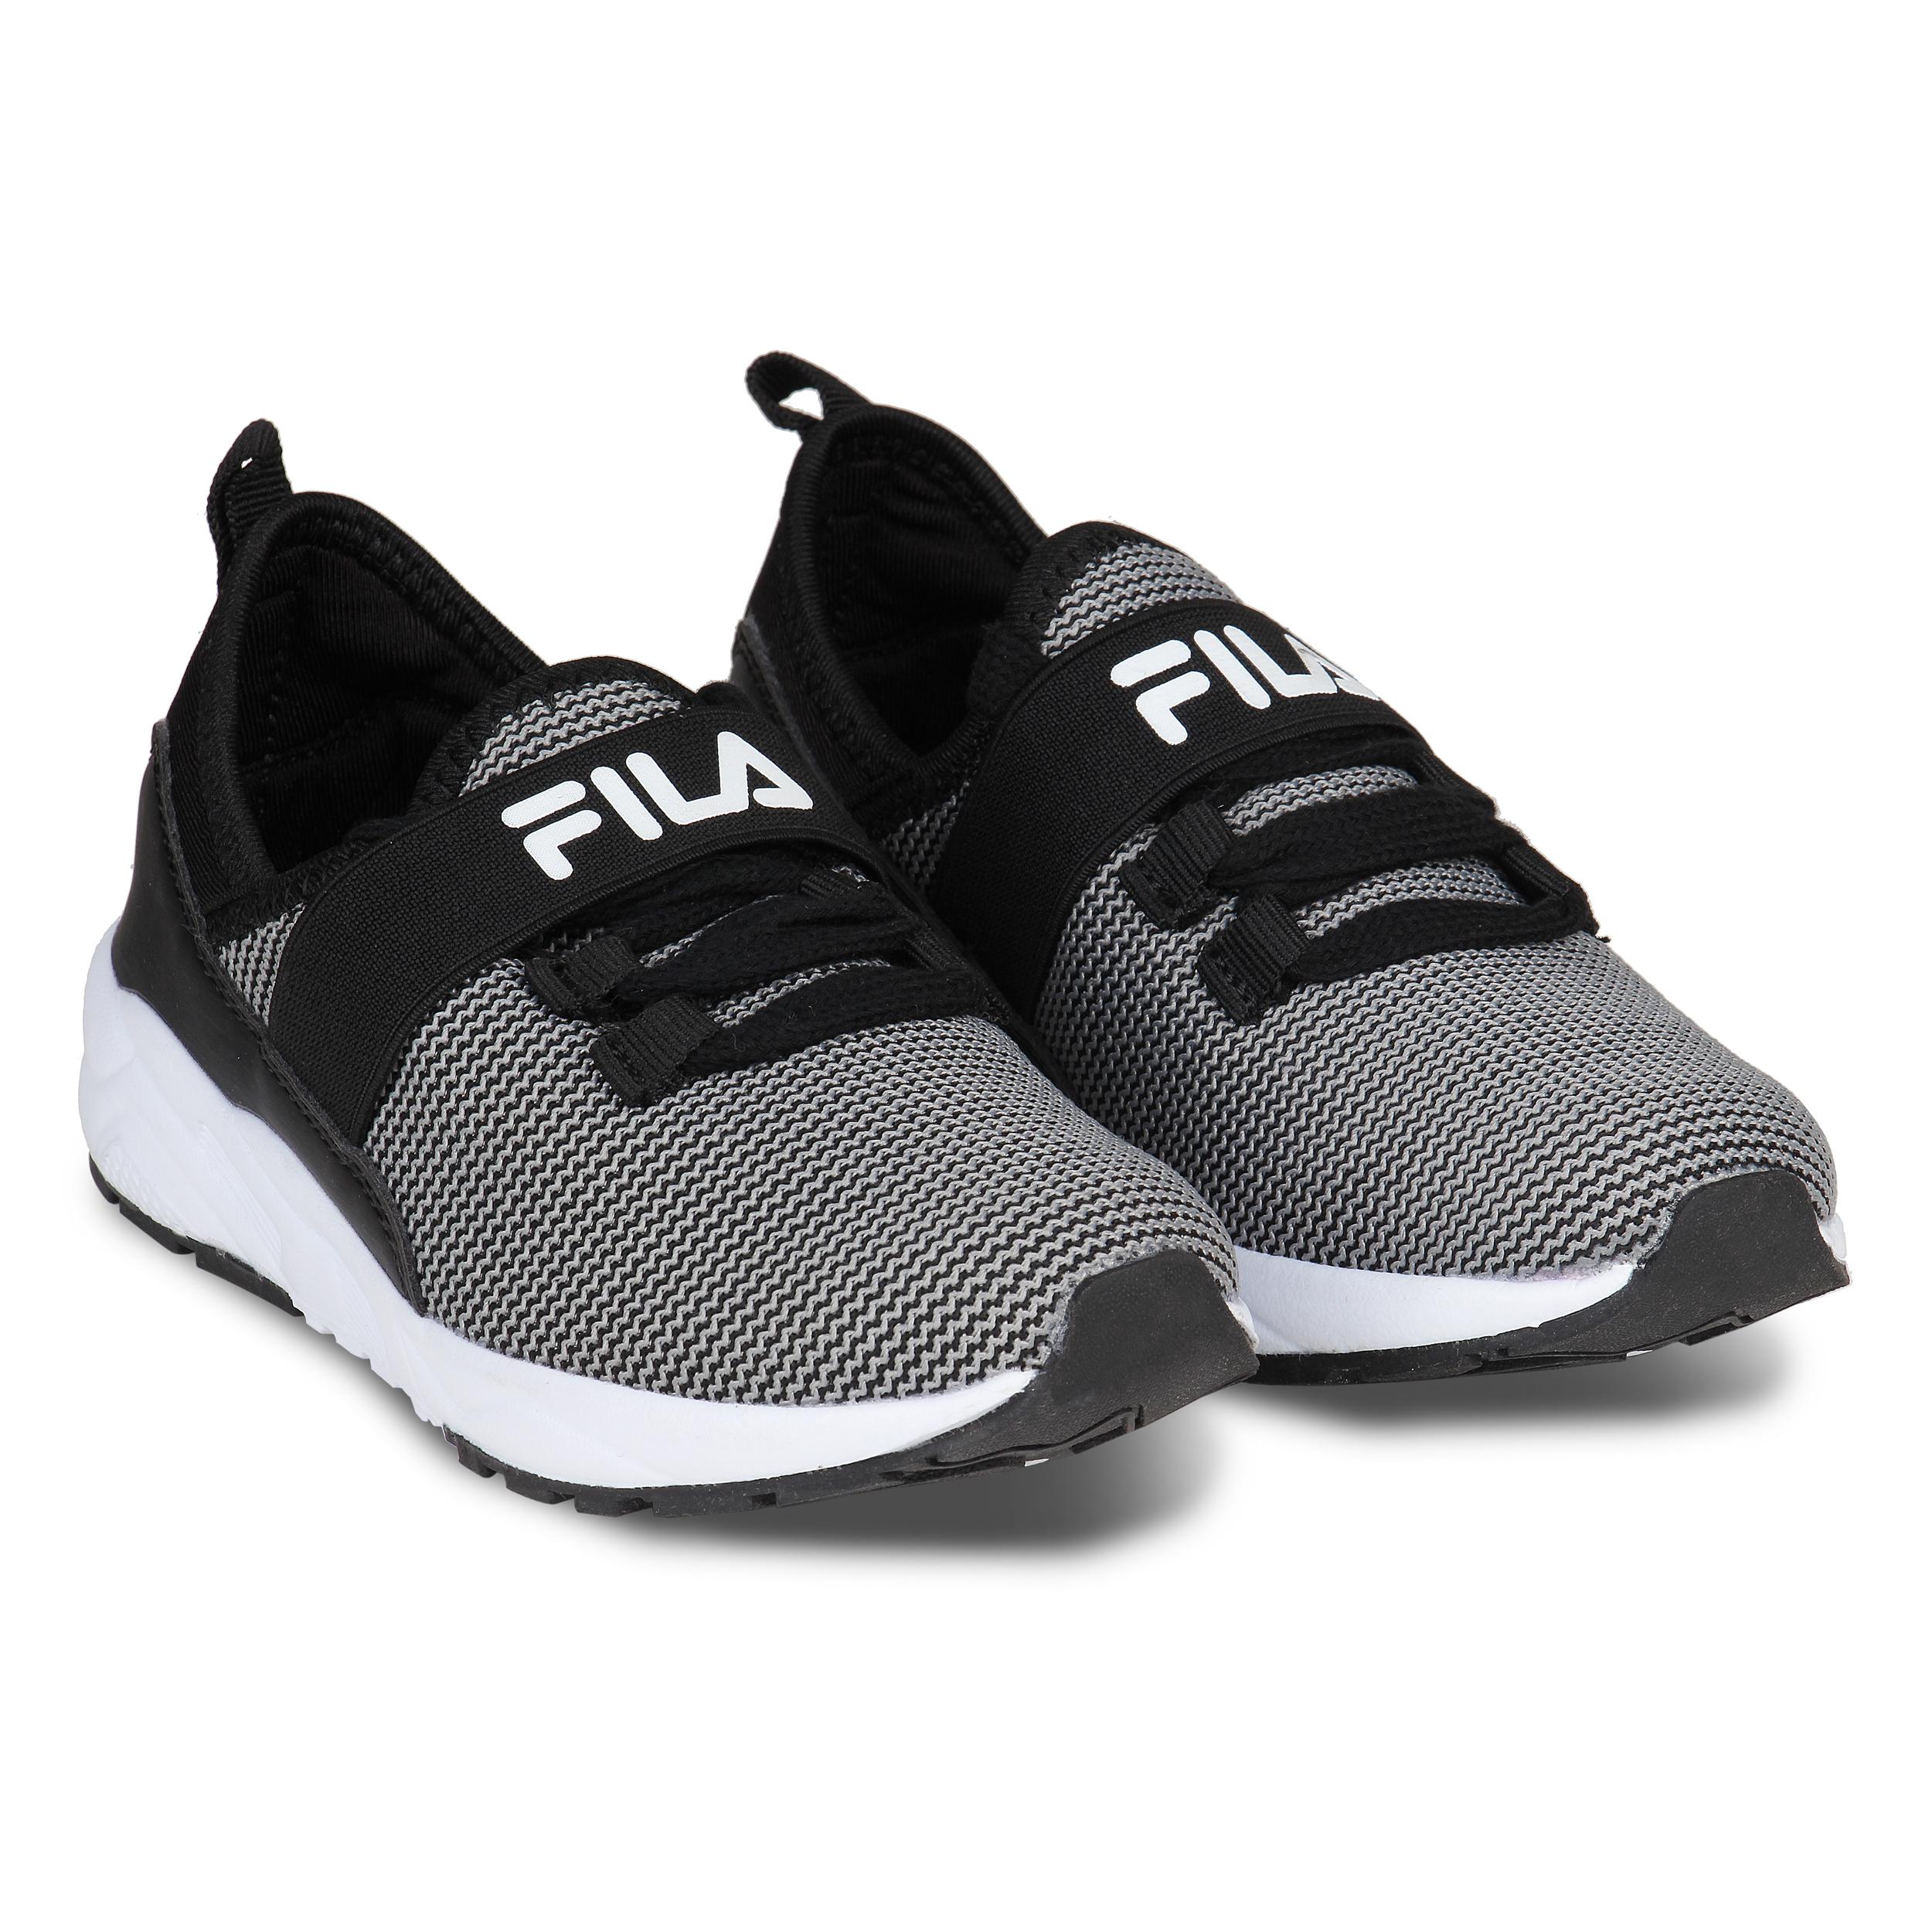 FILA | Black Casual Lace-ups